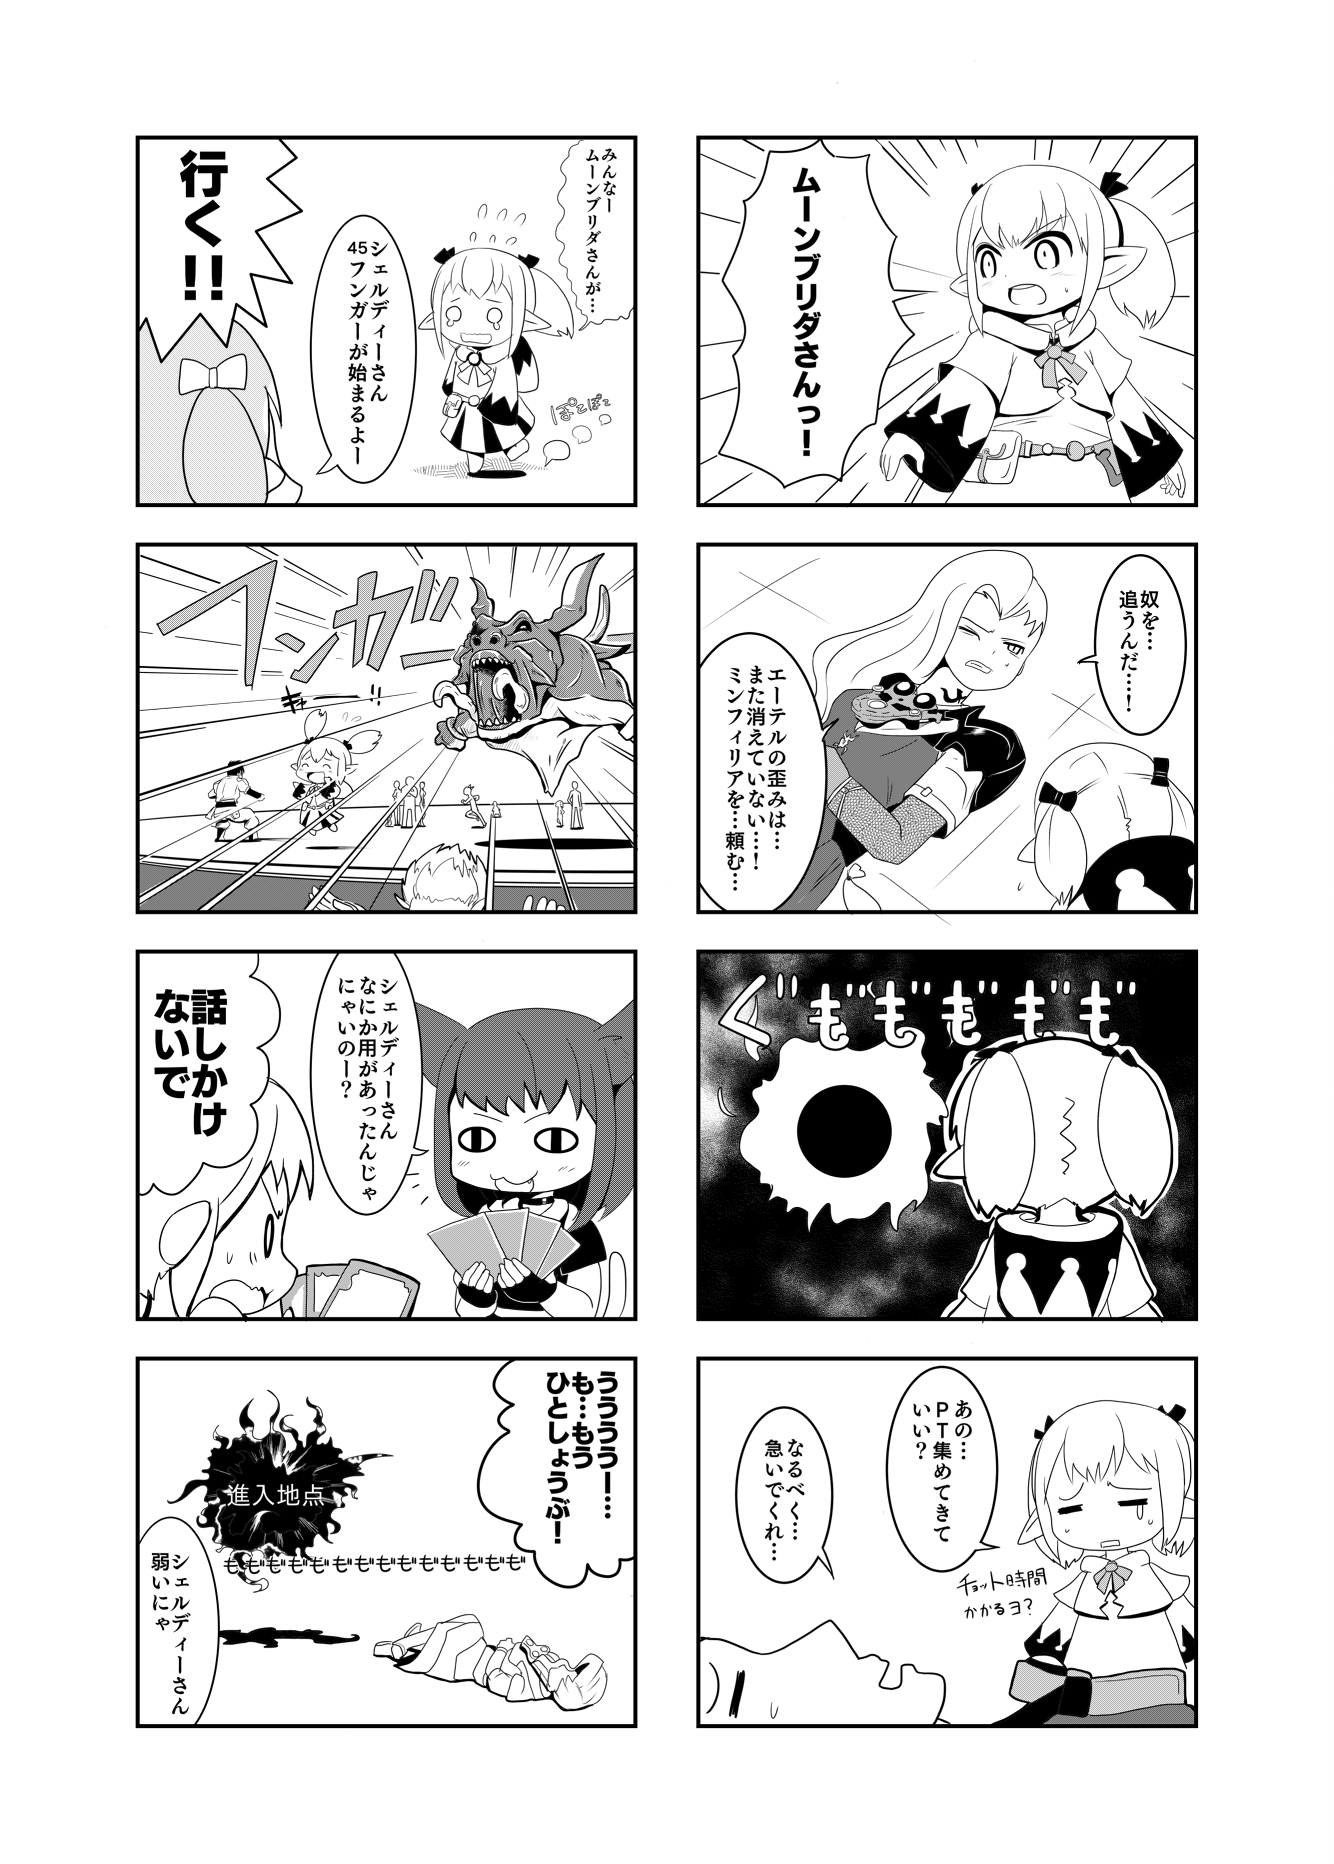 FF14 漫画まとめ